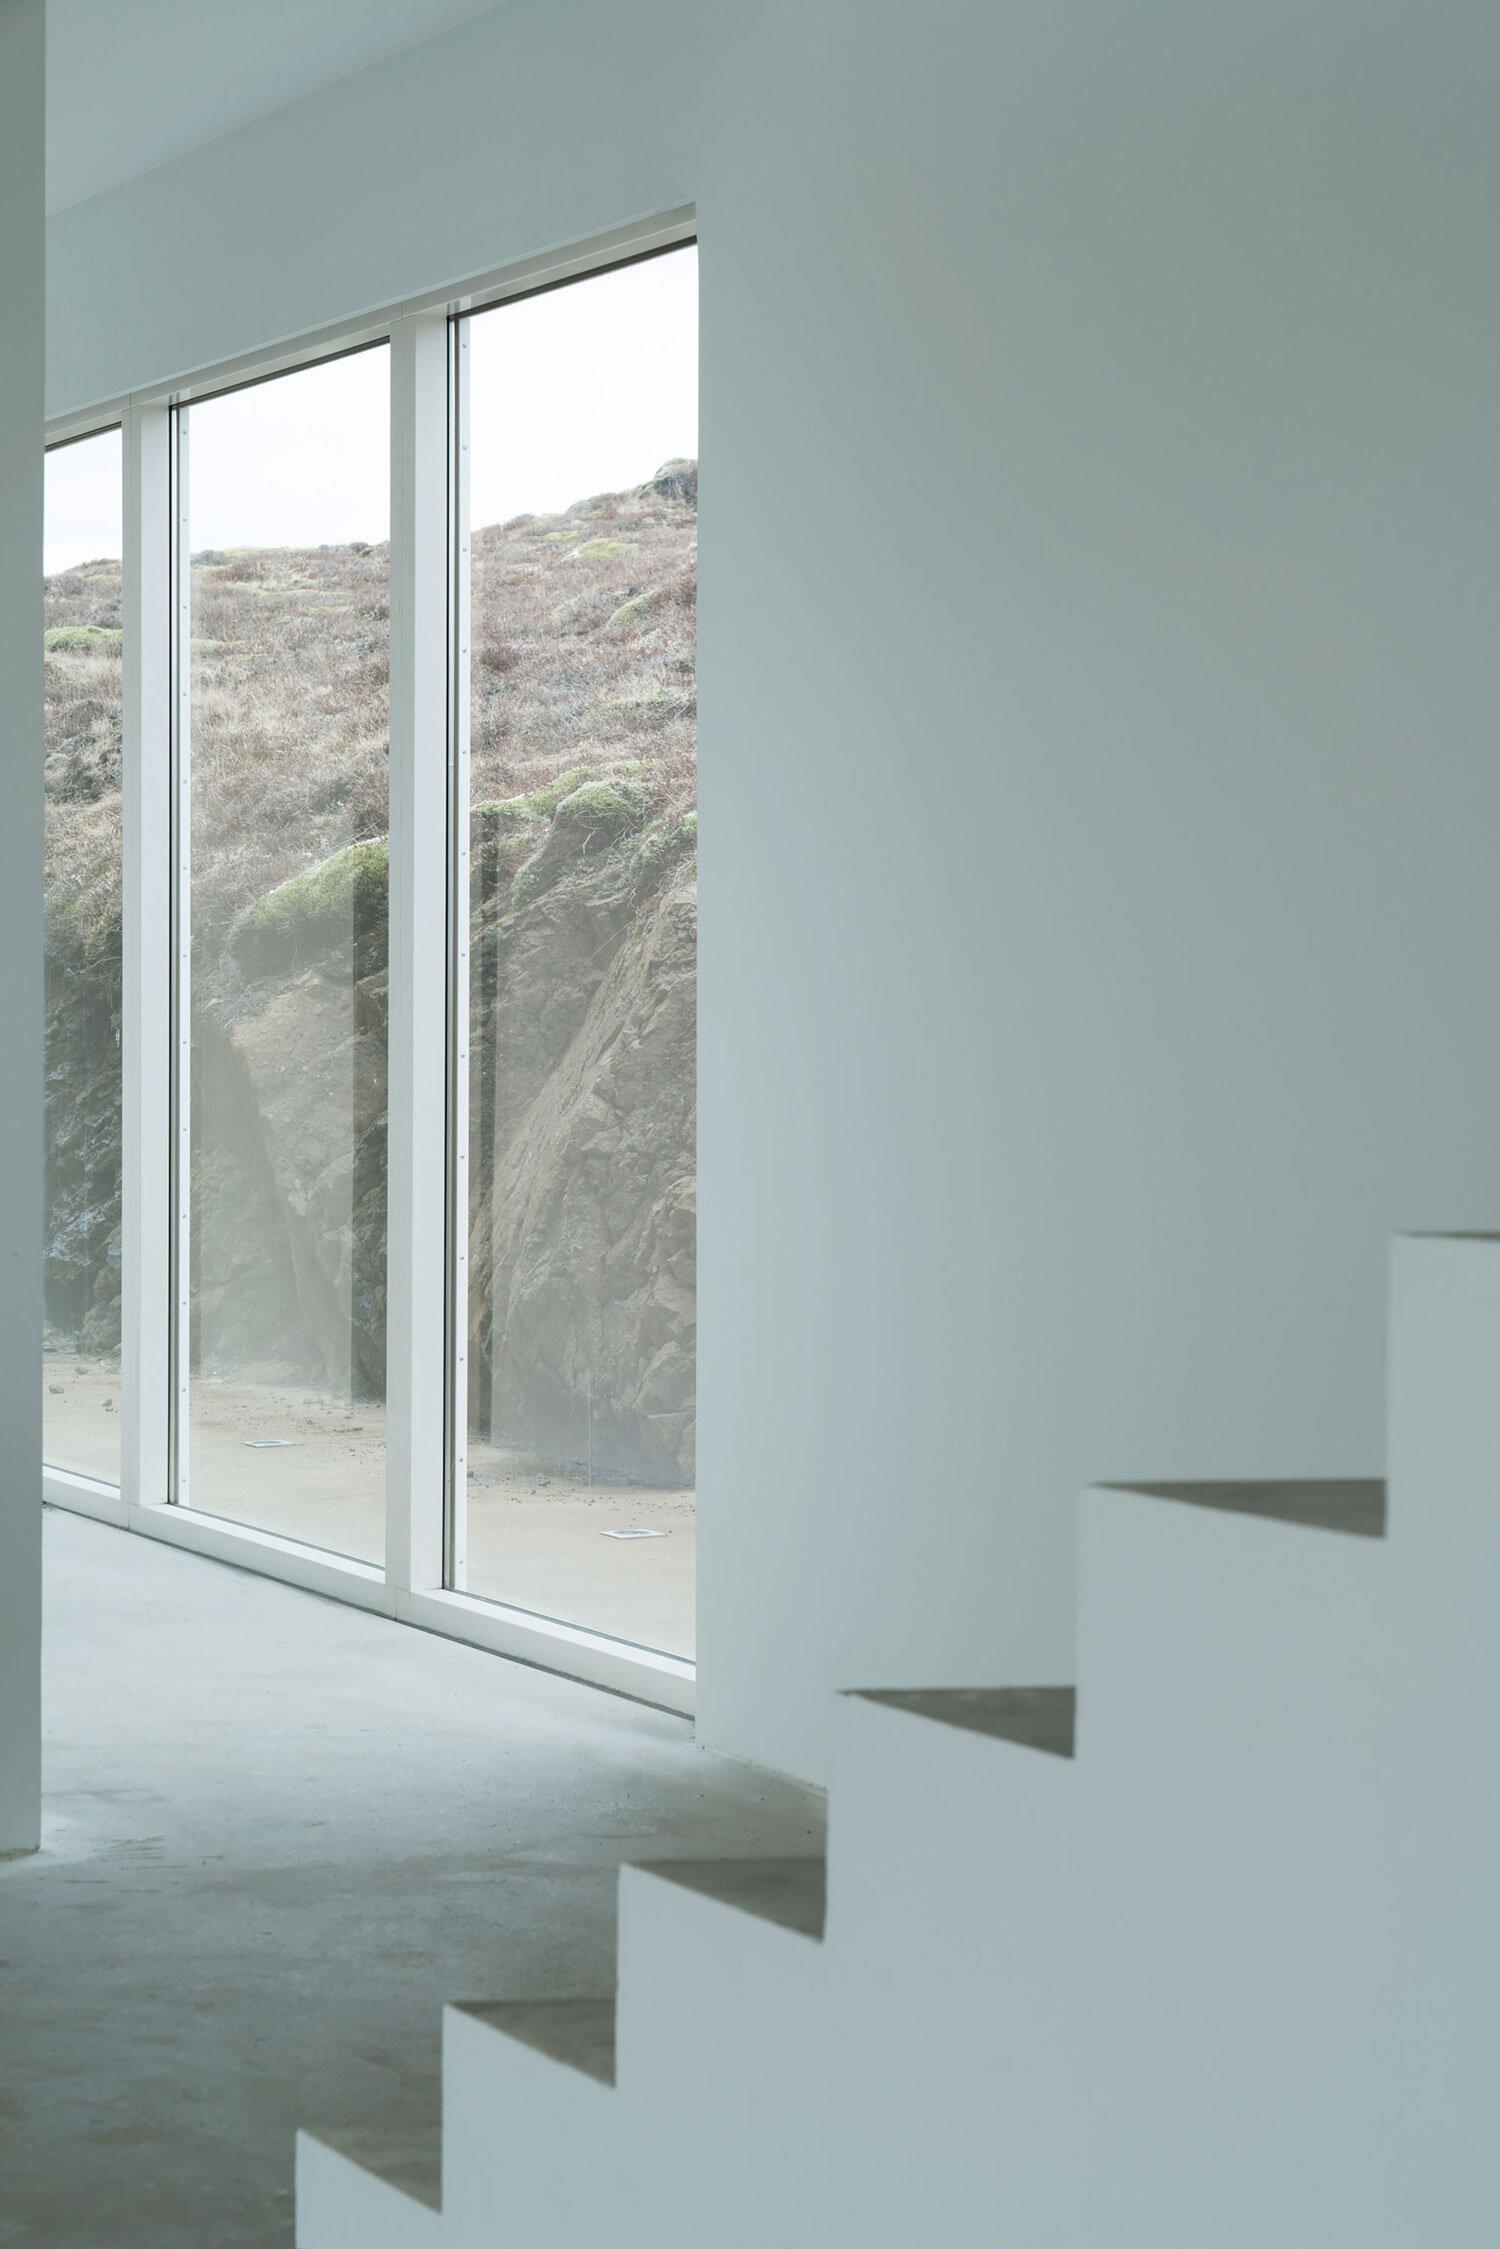 Langitangi Country House-Krads-Visual Atelier 8-Architecture-9.jpg